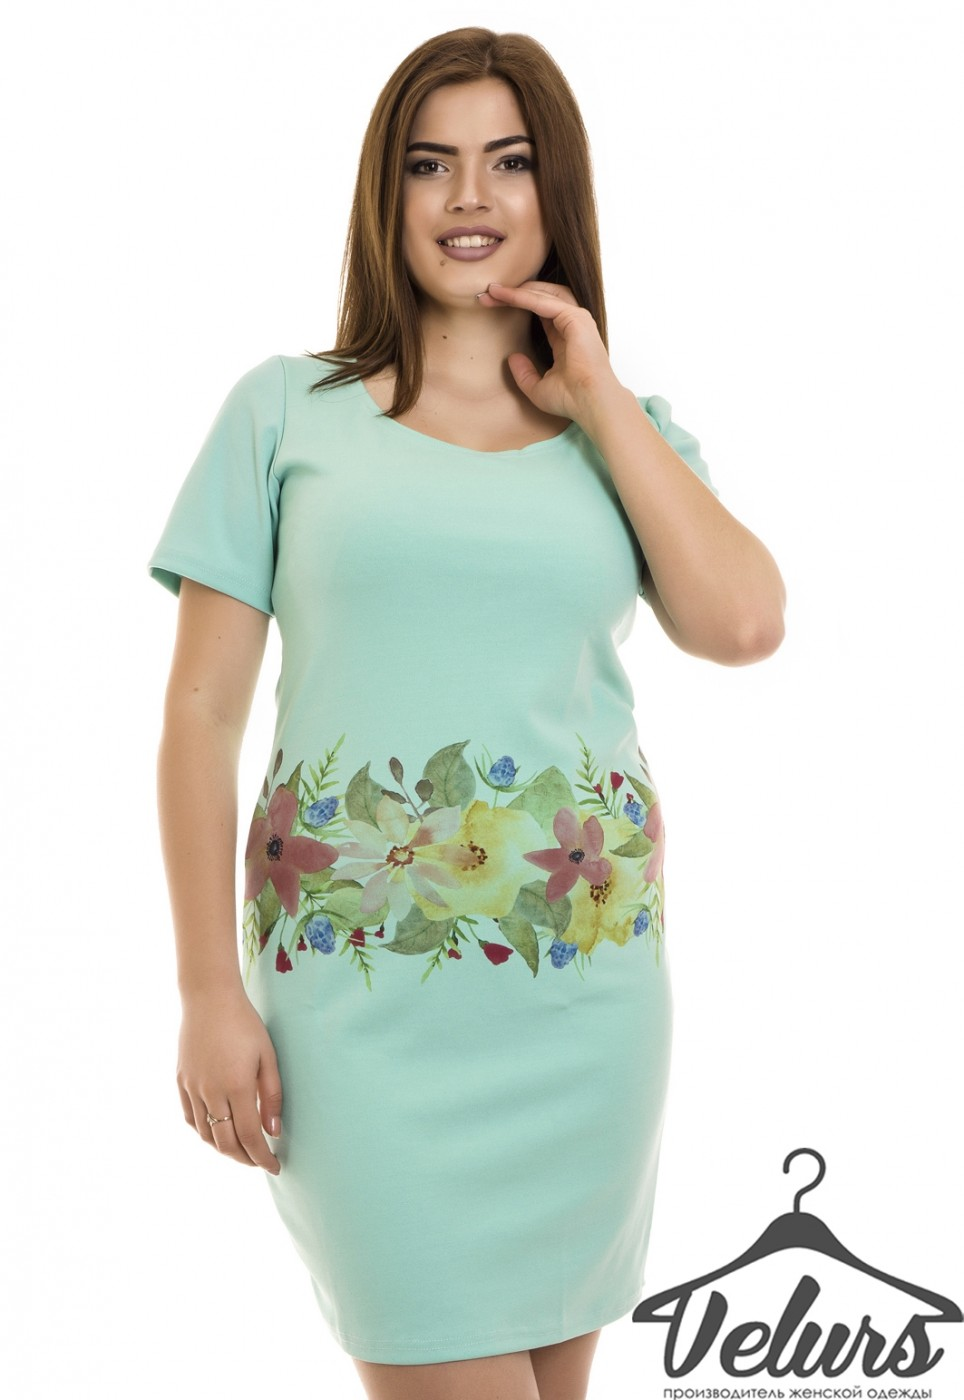 Velurs: Платье 212126 - фото 14